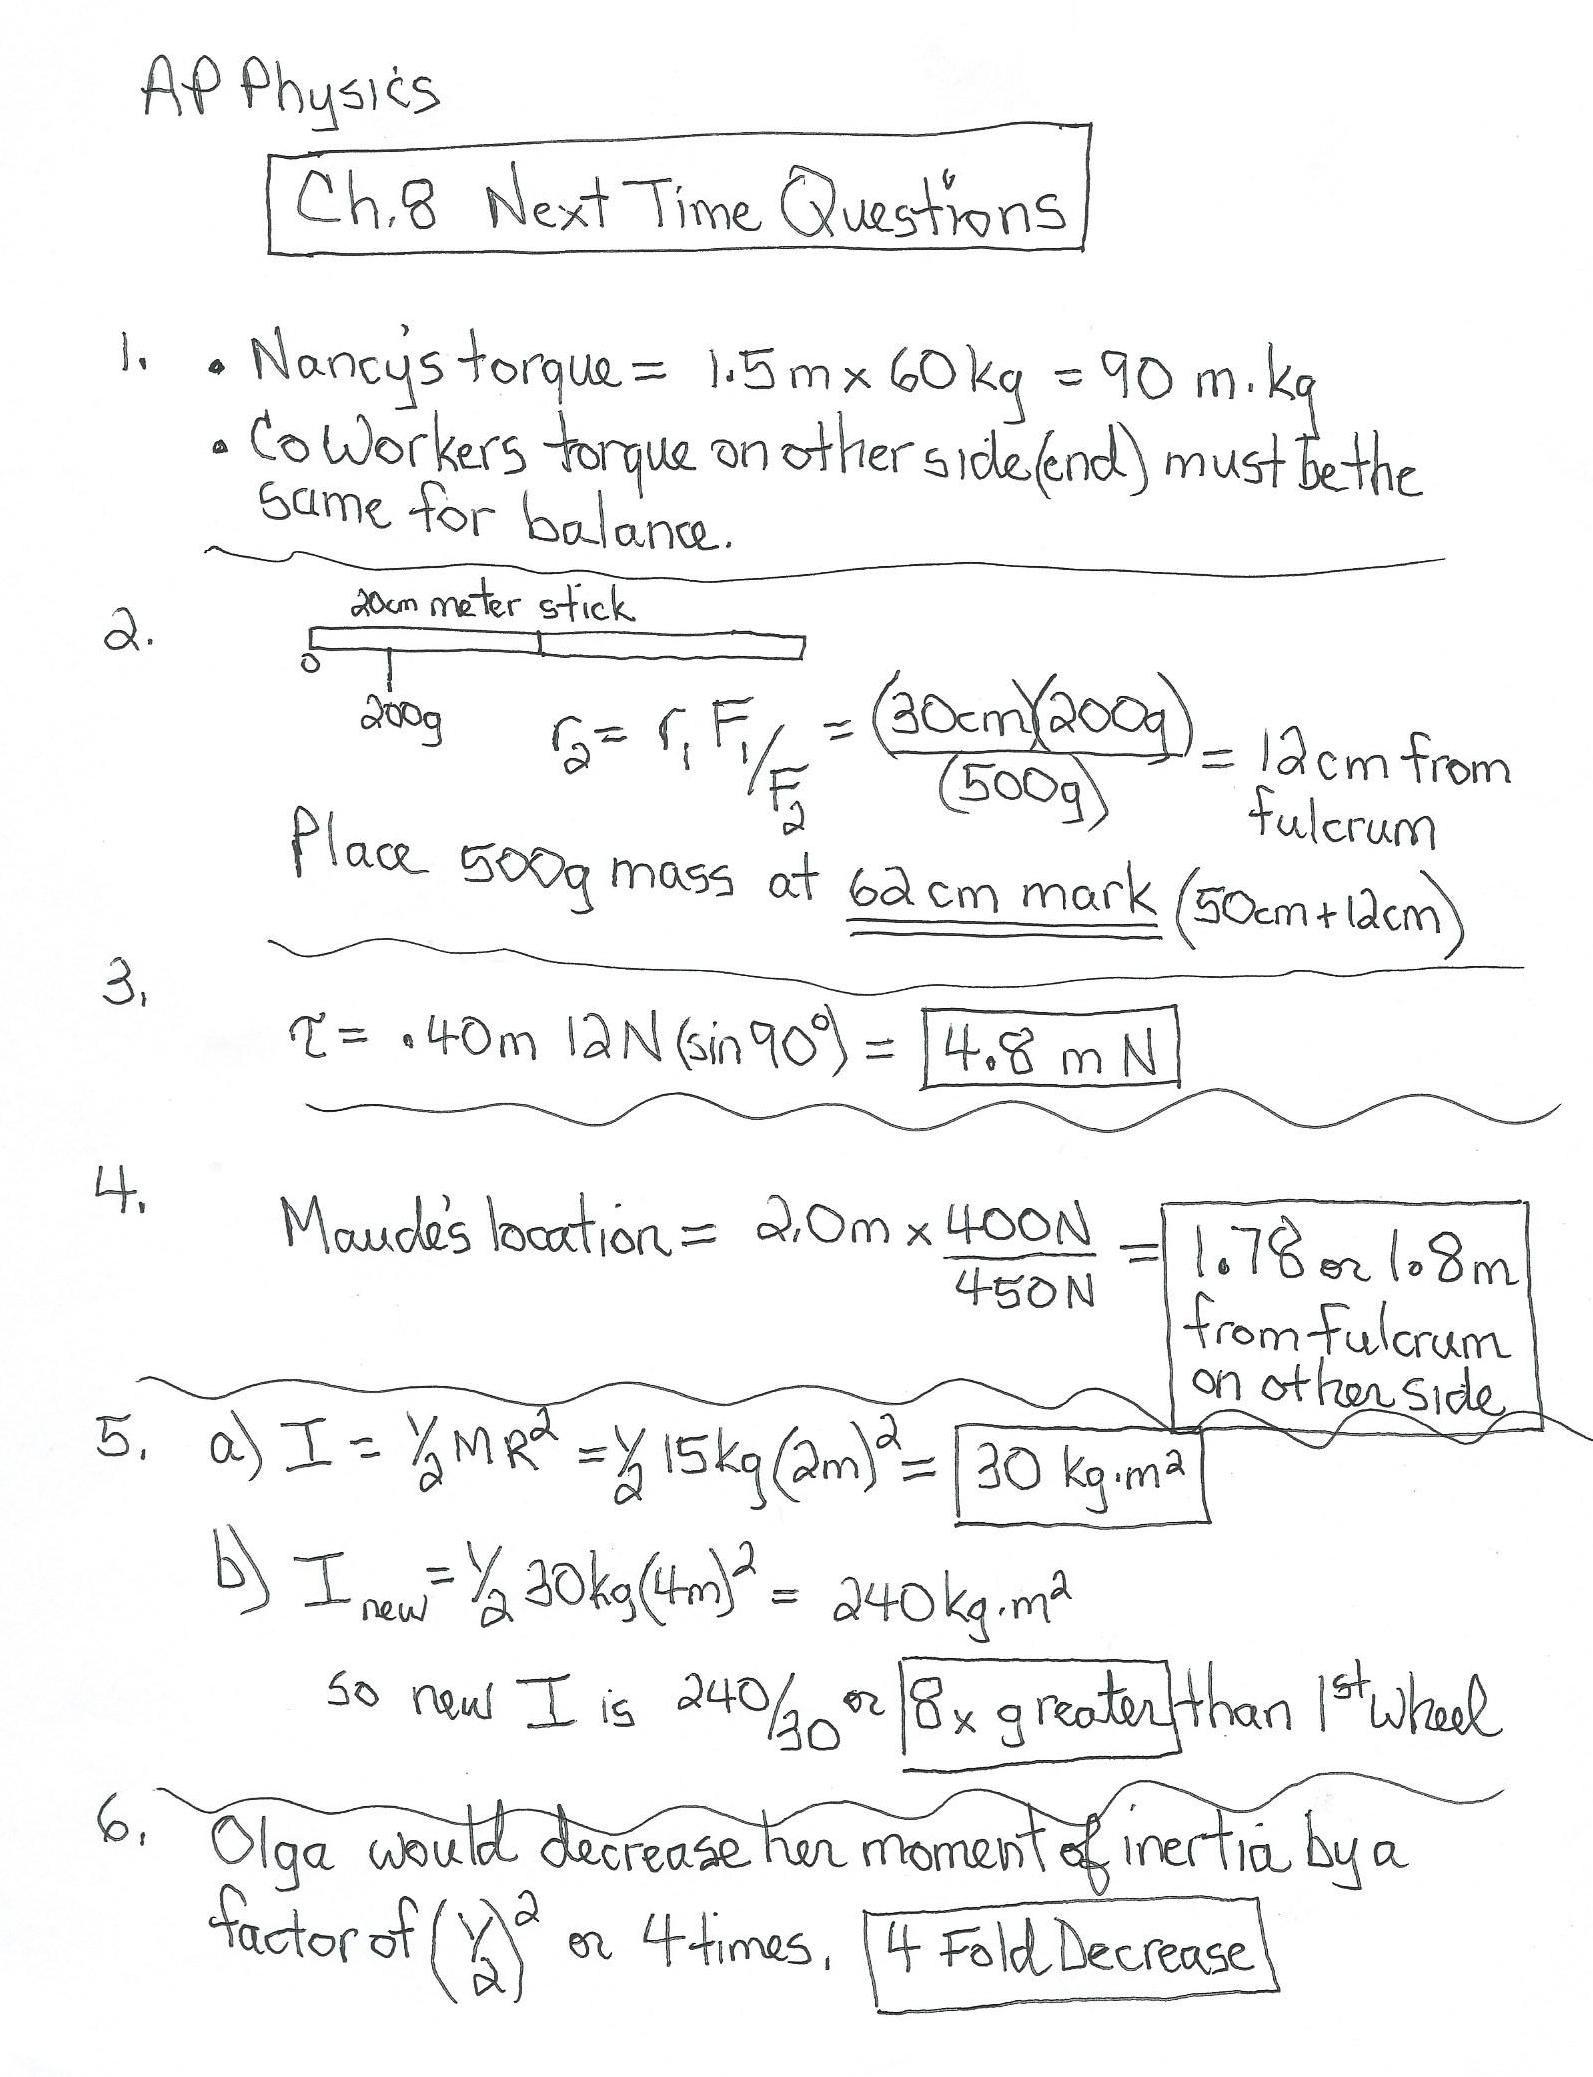 worksheet Centripetal Force Worksheet south pasadena high school apphys chap 8 ntq answers side 1 jpg